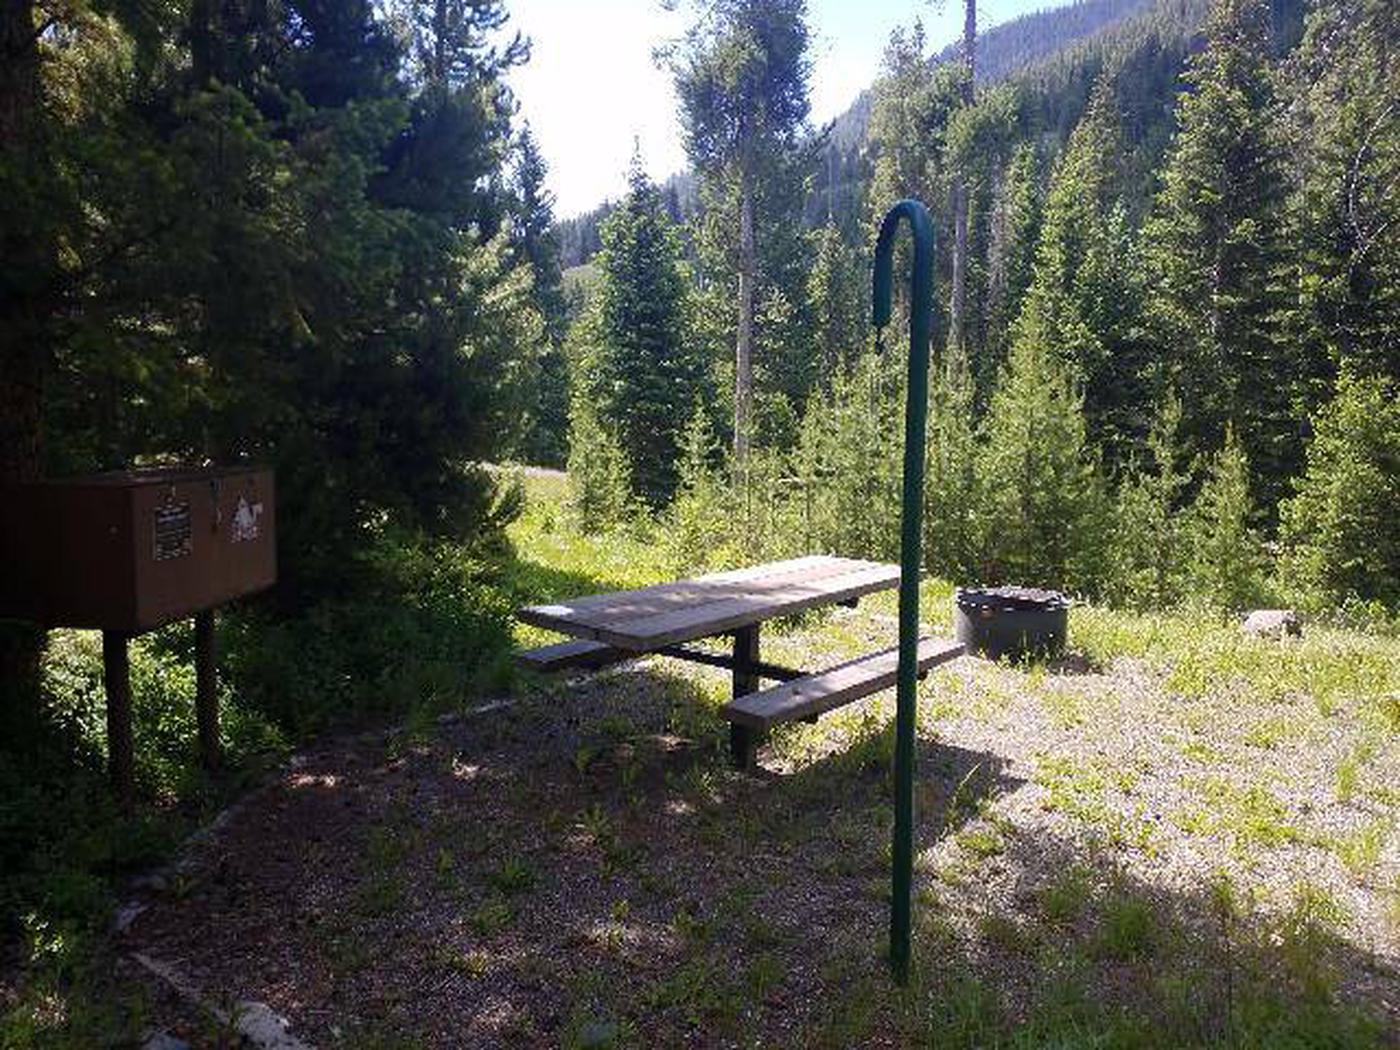 Threemile Campground Campsite 9 - Back View